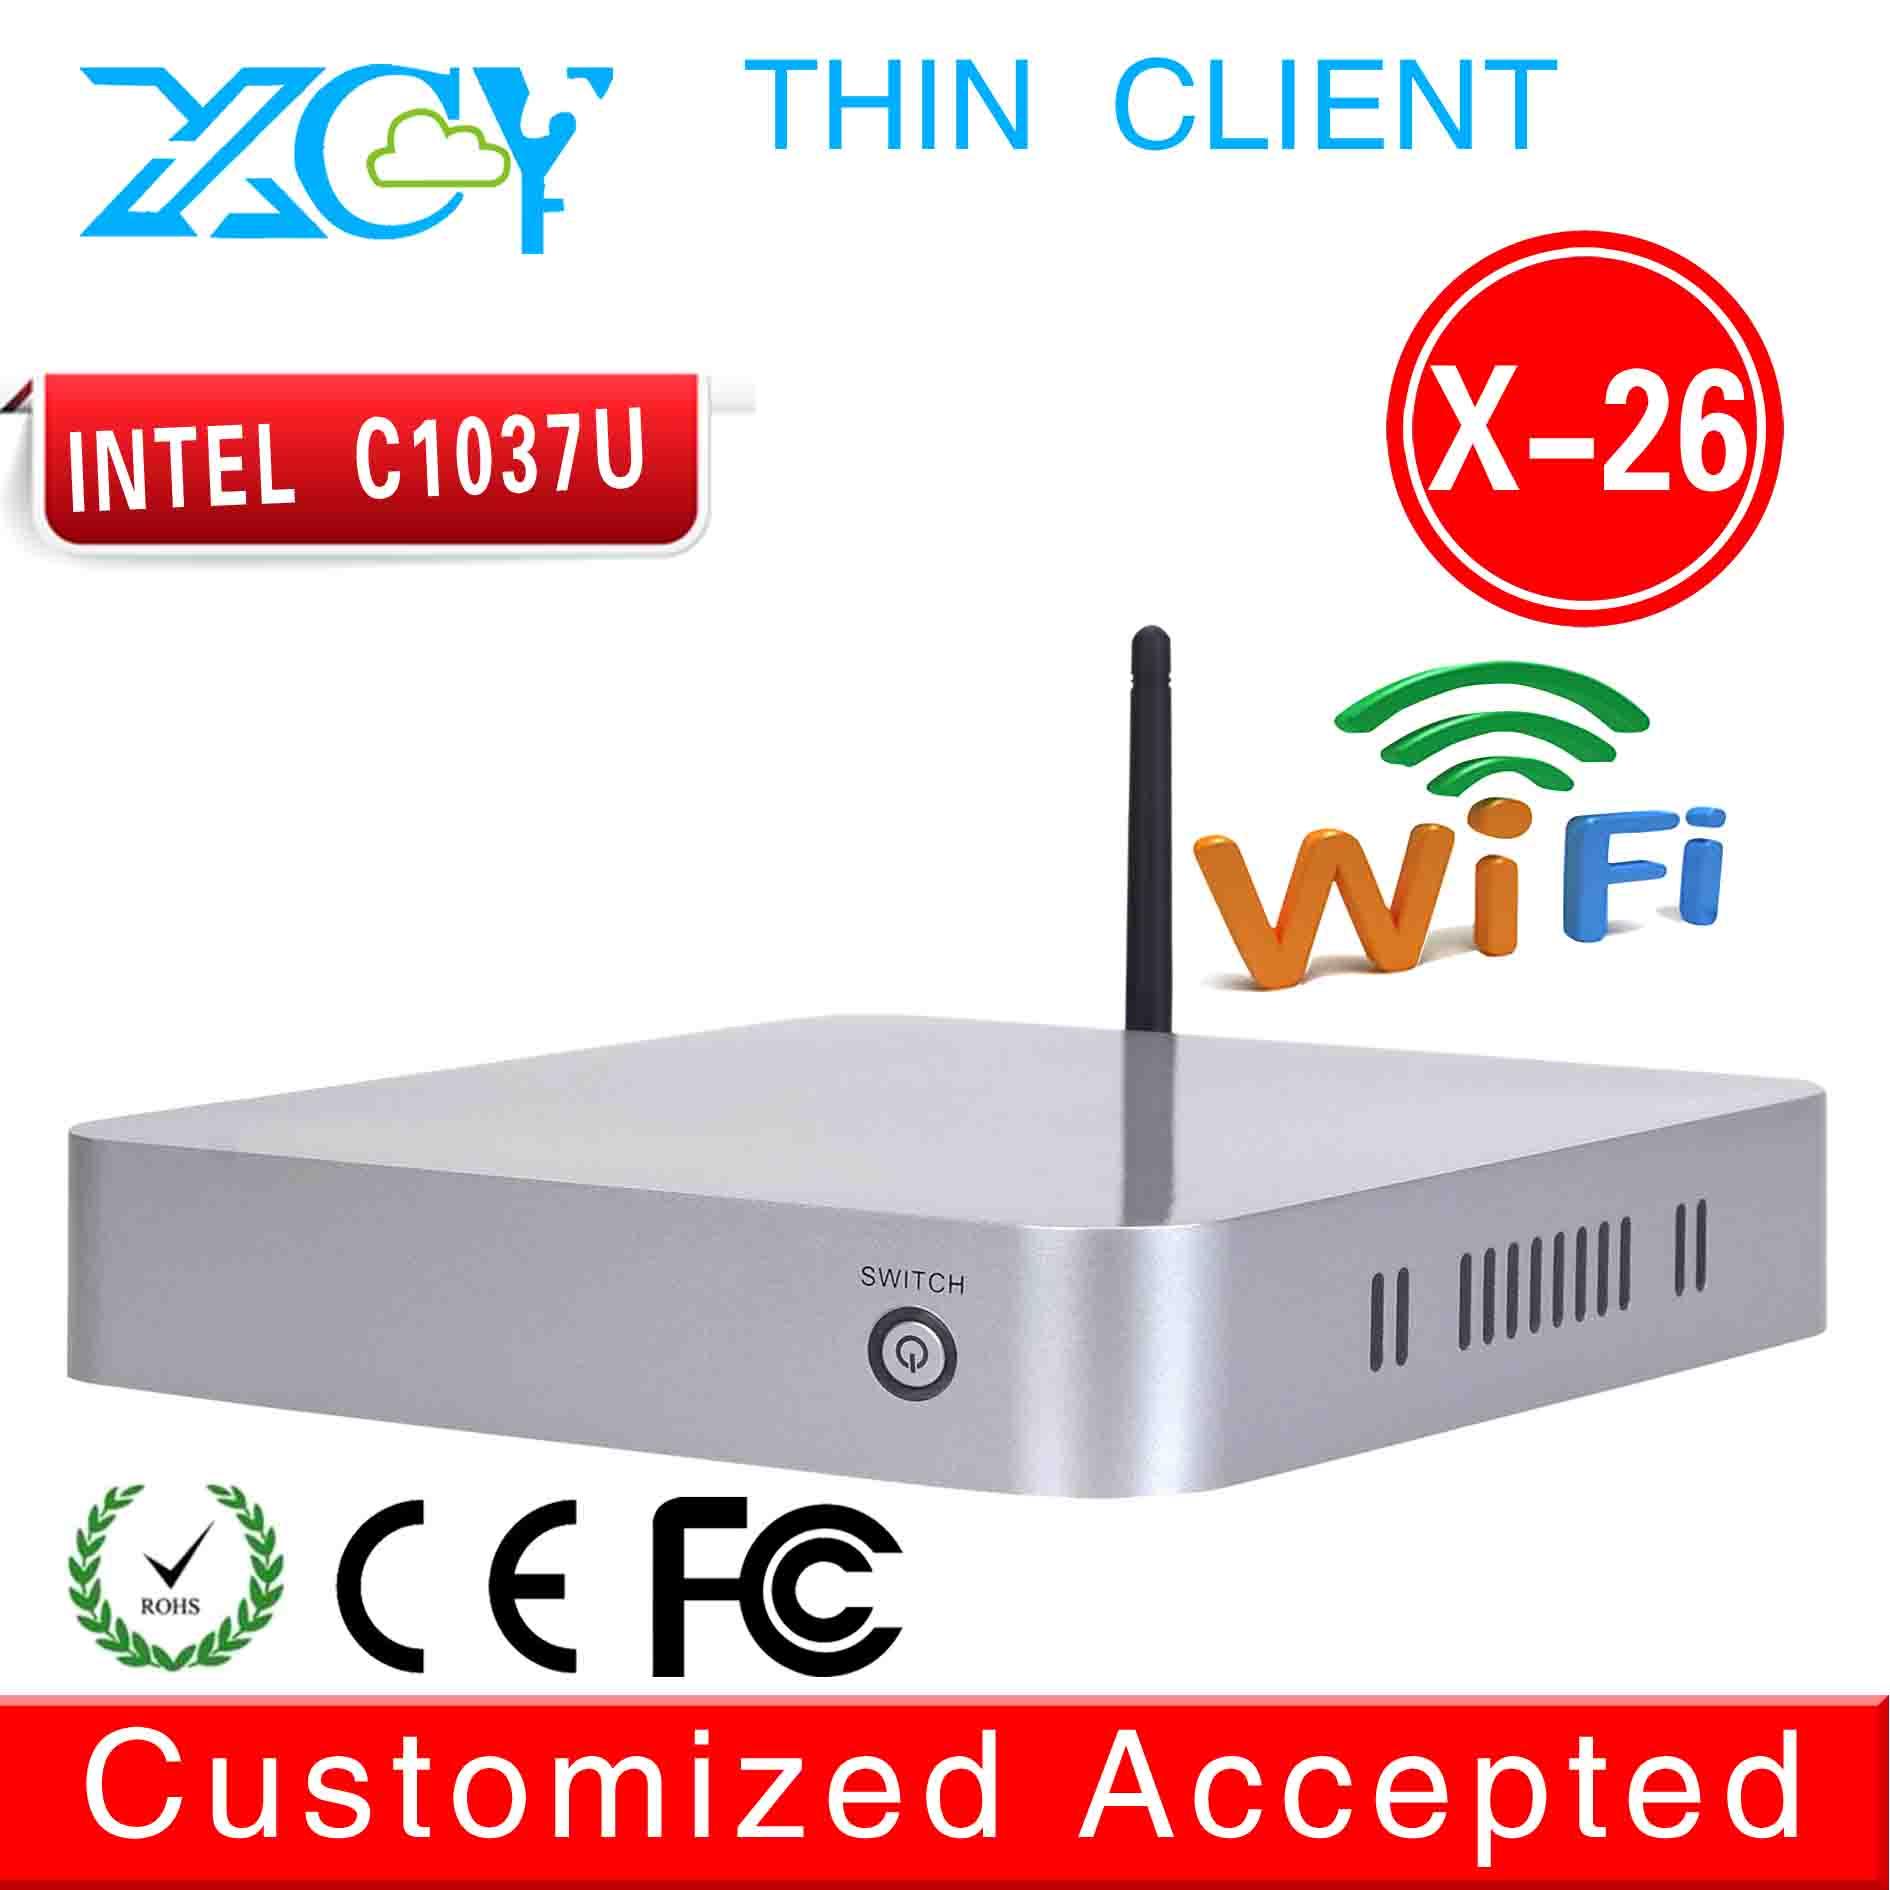 INTEL C1037U Celeron mini pc computer networking industrial pcs support youtube, mesenger, skyp, video call(China (Mainland))